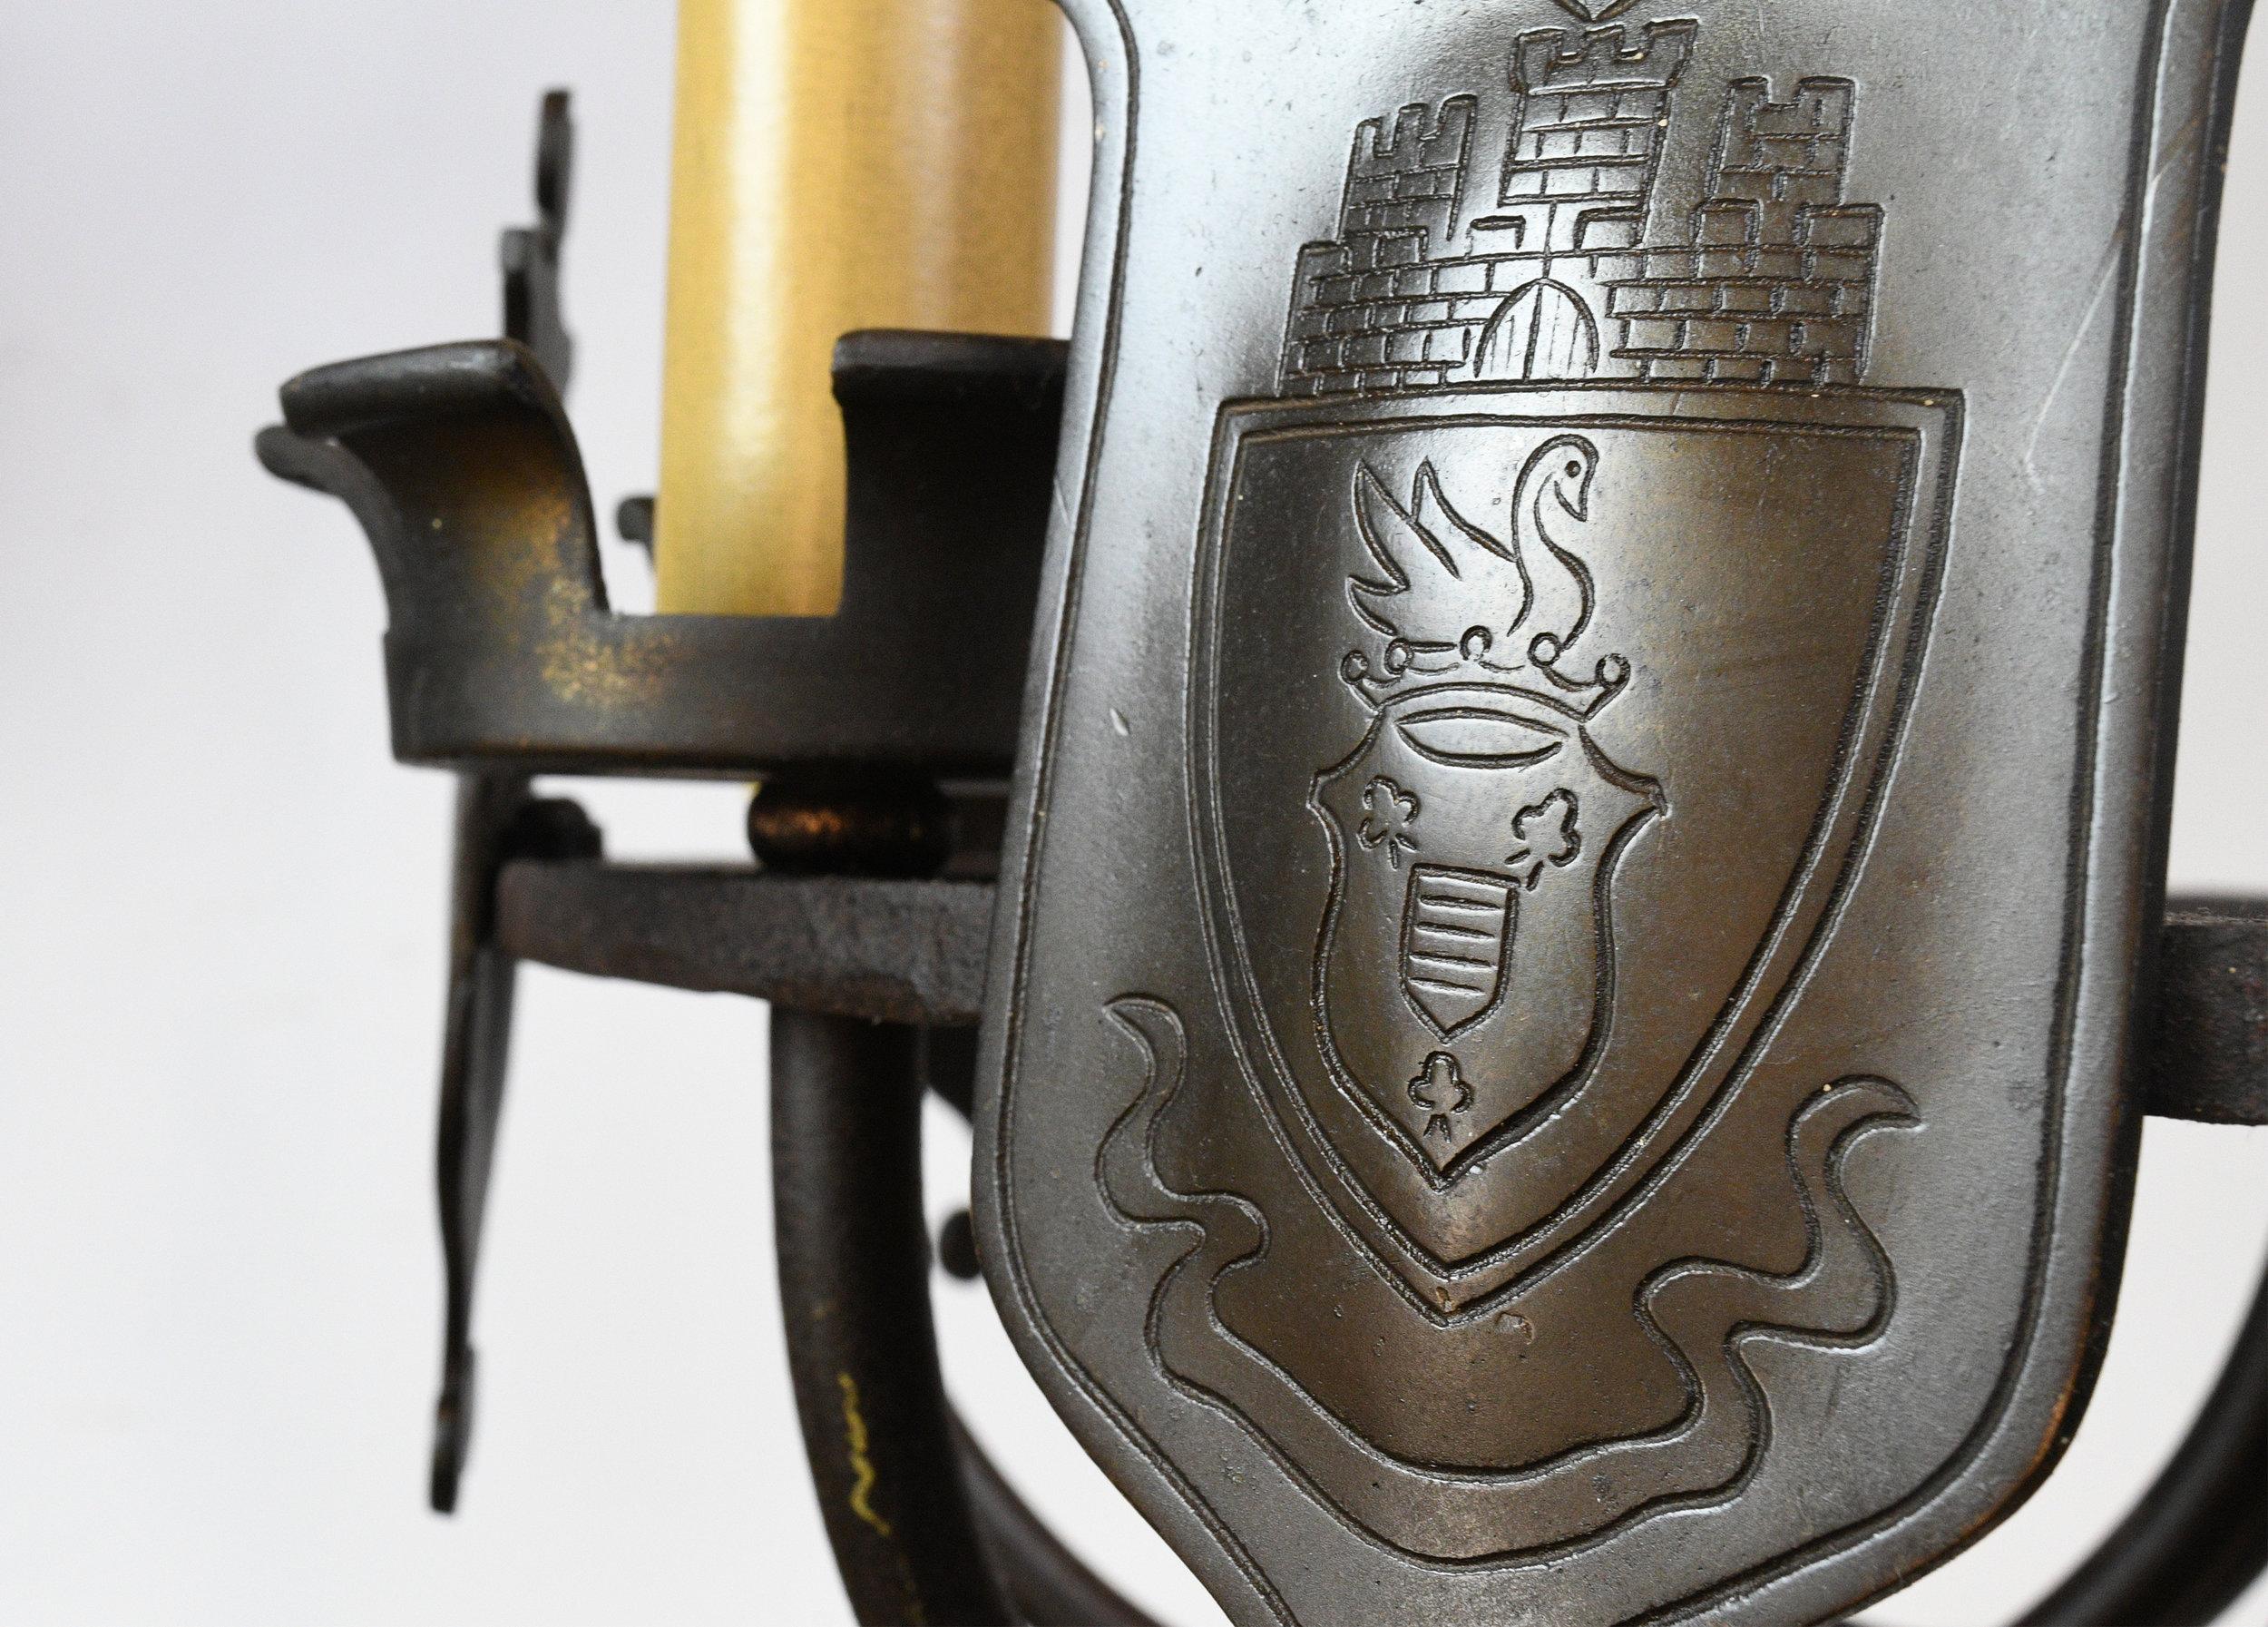 47538-iron-tudor-chand-with-hoop-shield-detail-3.jpg